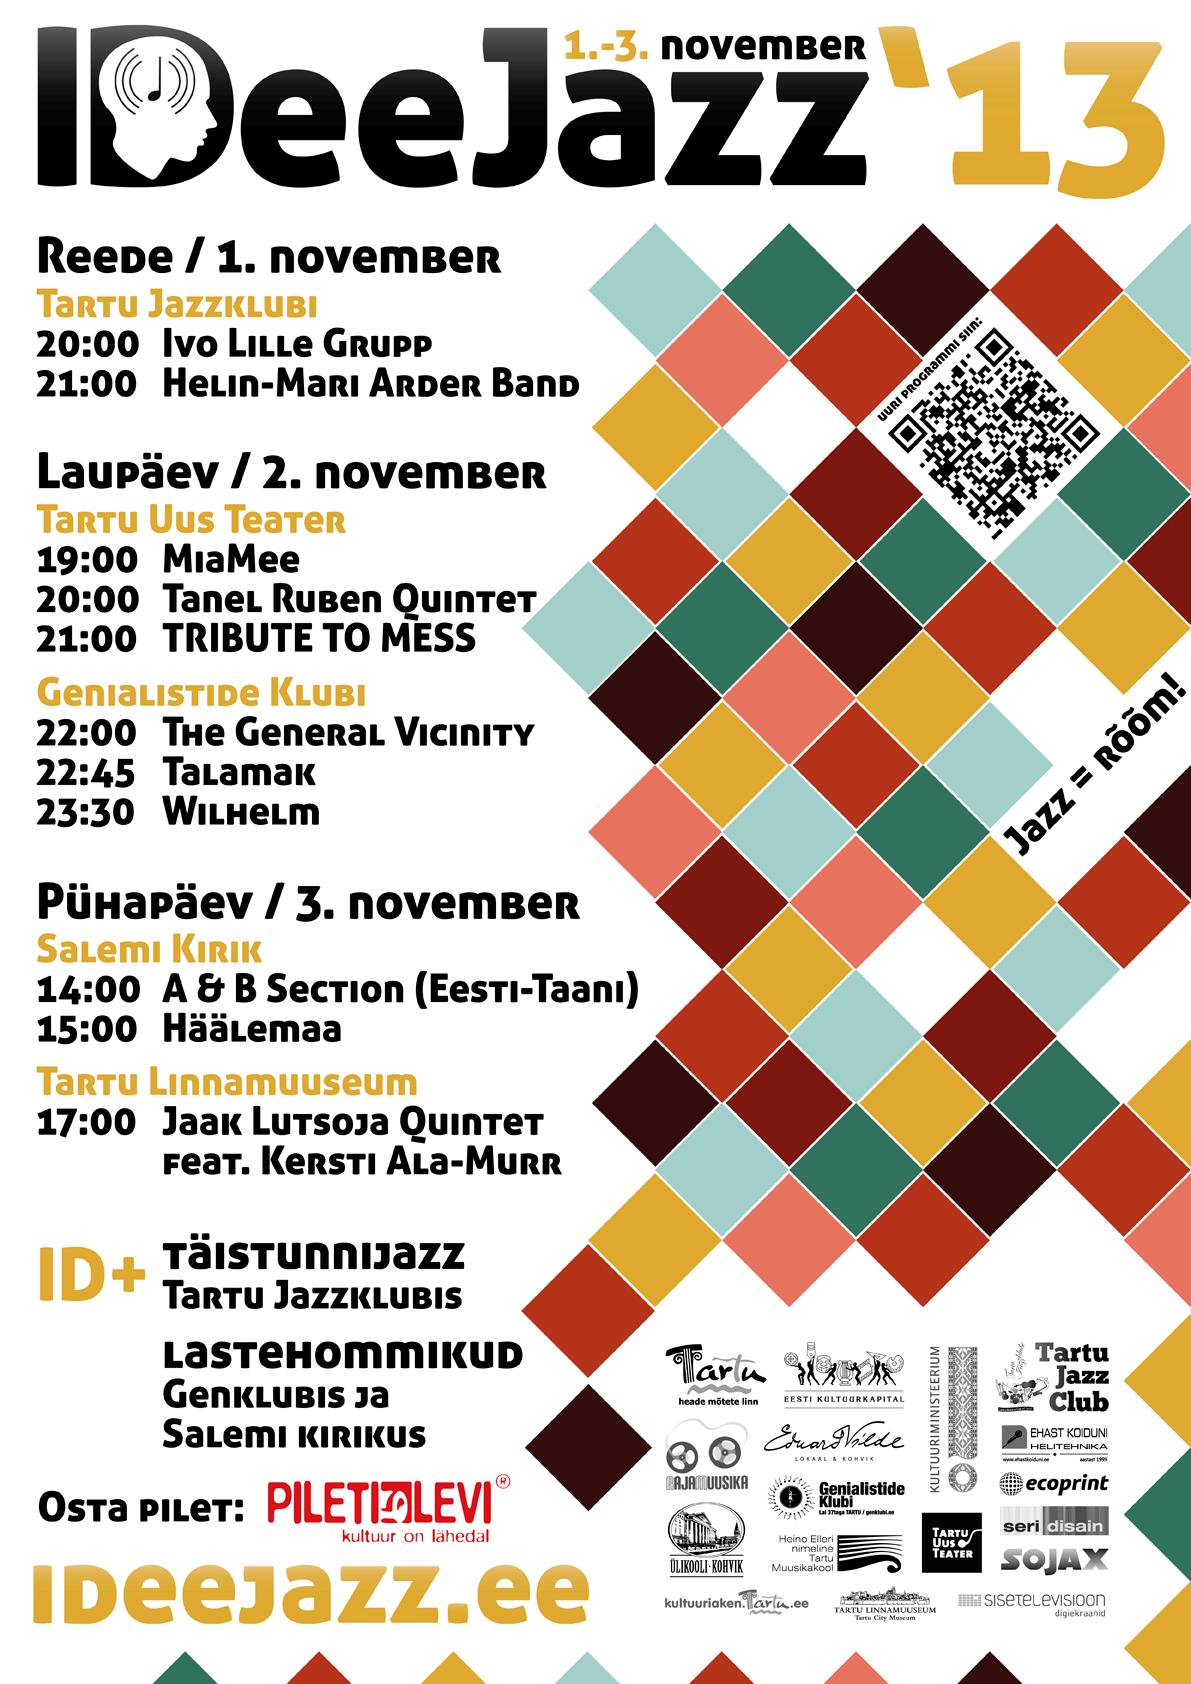 IDeeJazz13-plakat-veeb